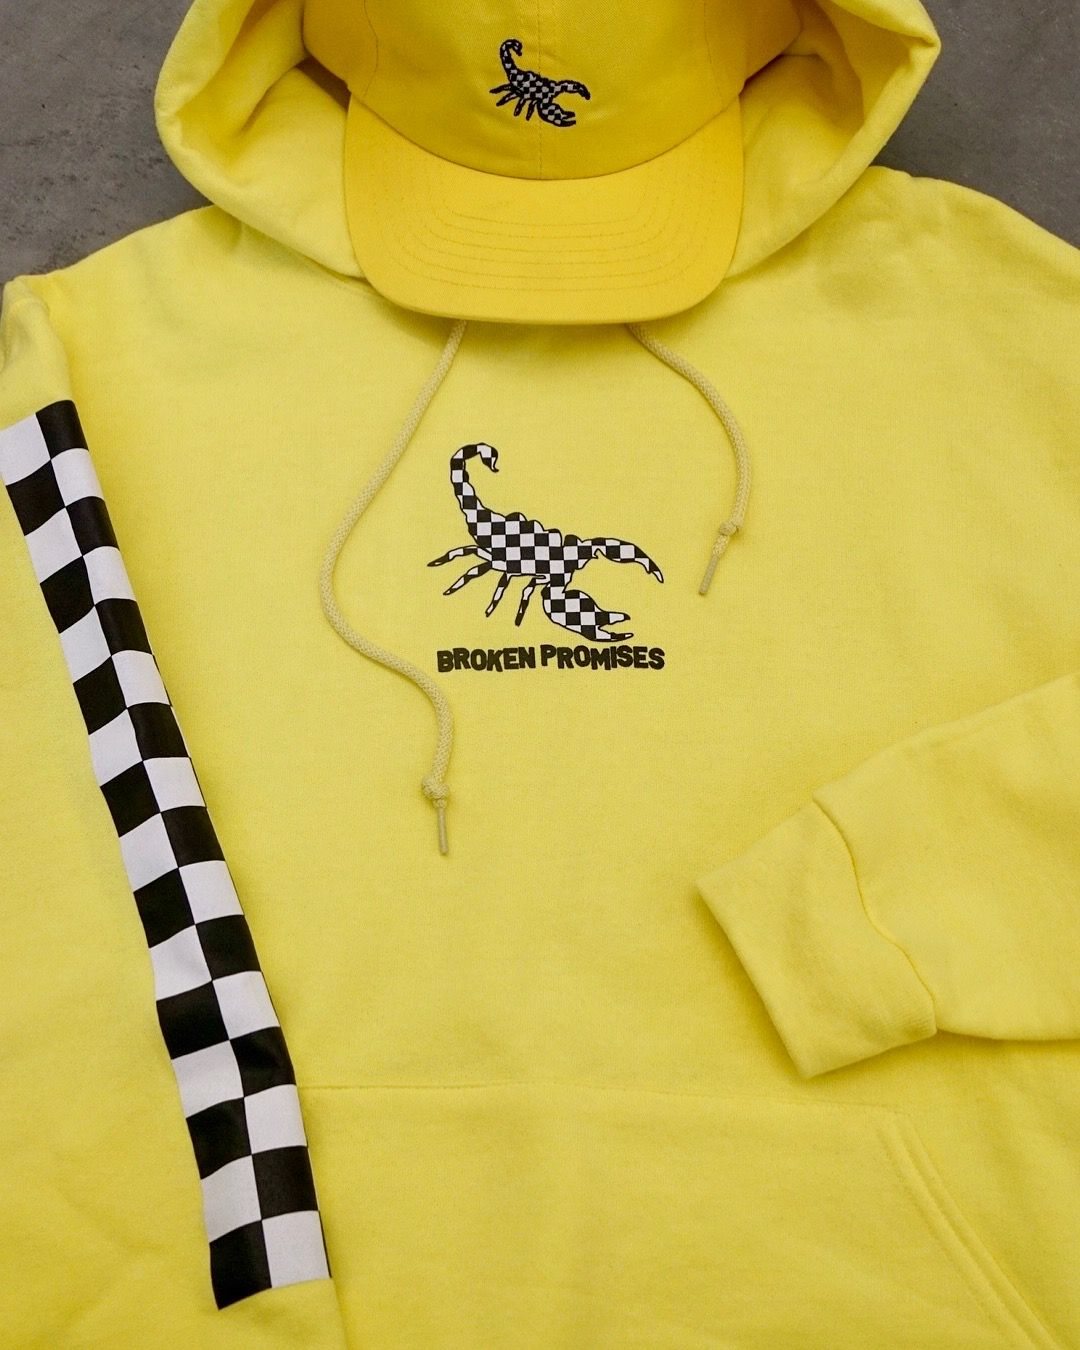 Broken promises 2 tone neon yellow hoodie yellow hoodie